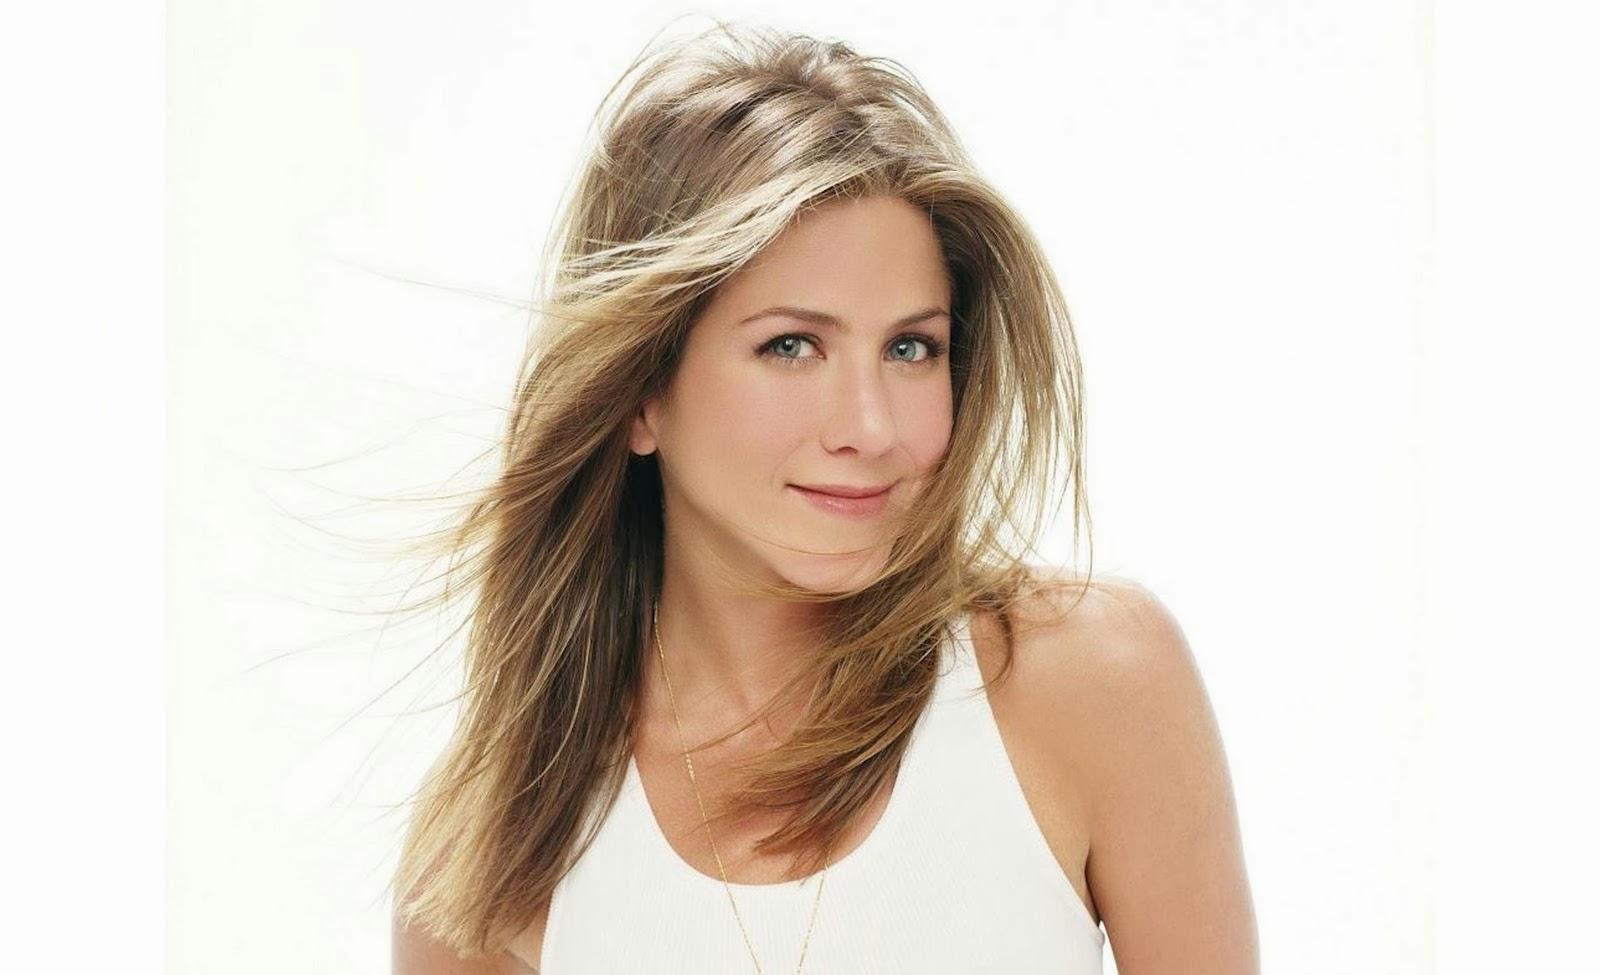 Celebrity Hd Wallpapers Actress Jennifer Aniston Hot Hd -8246